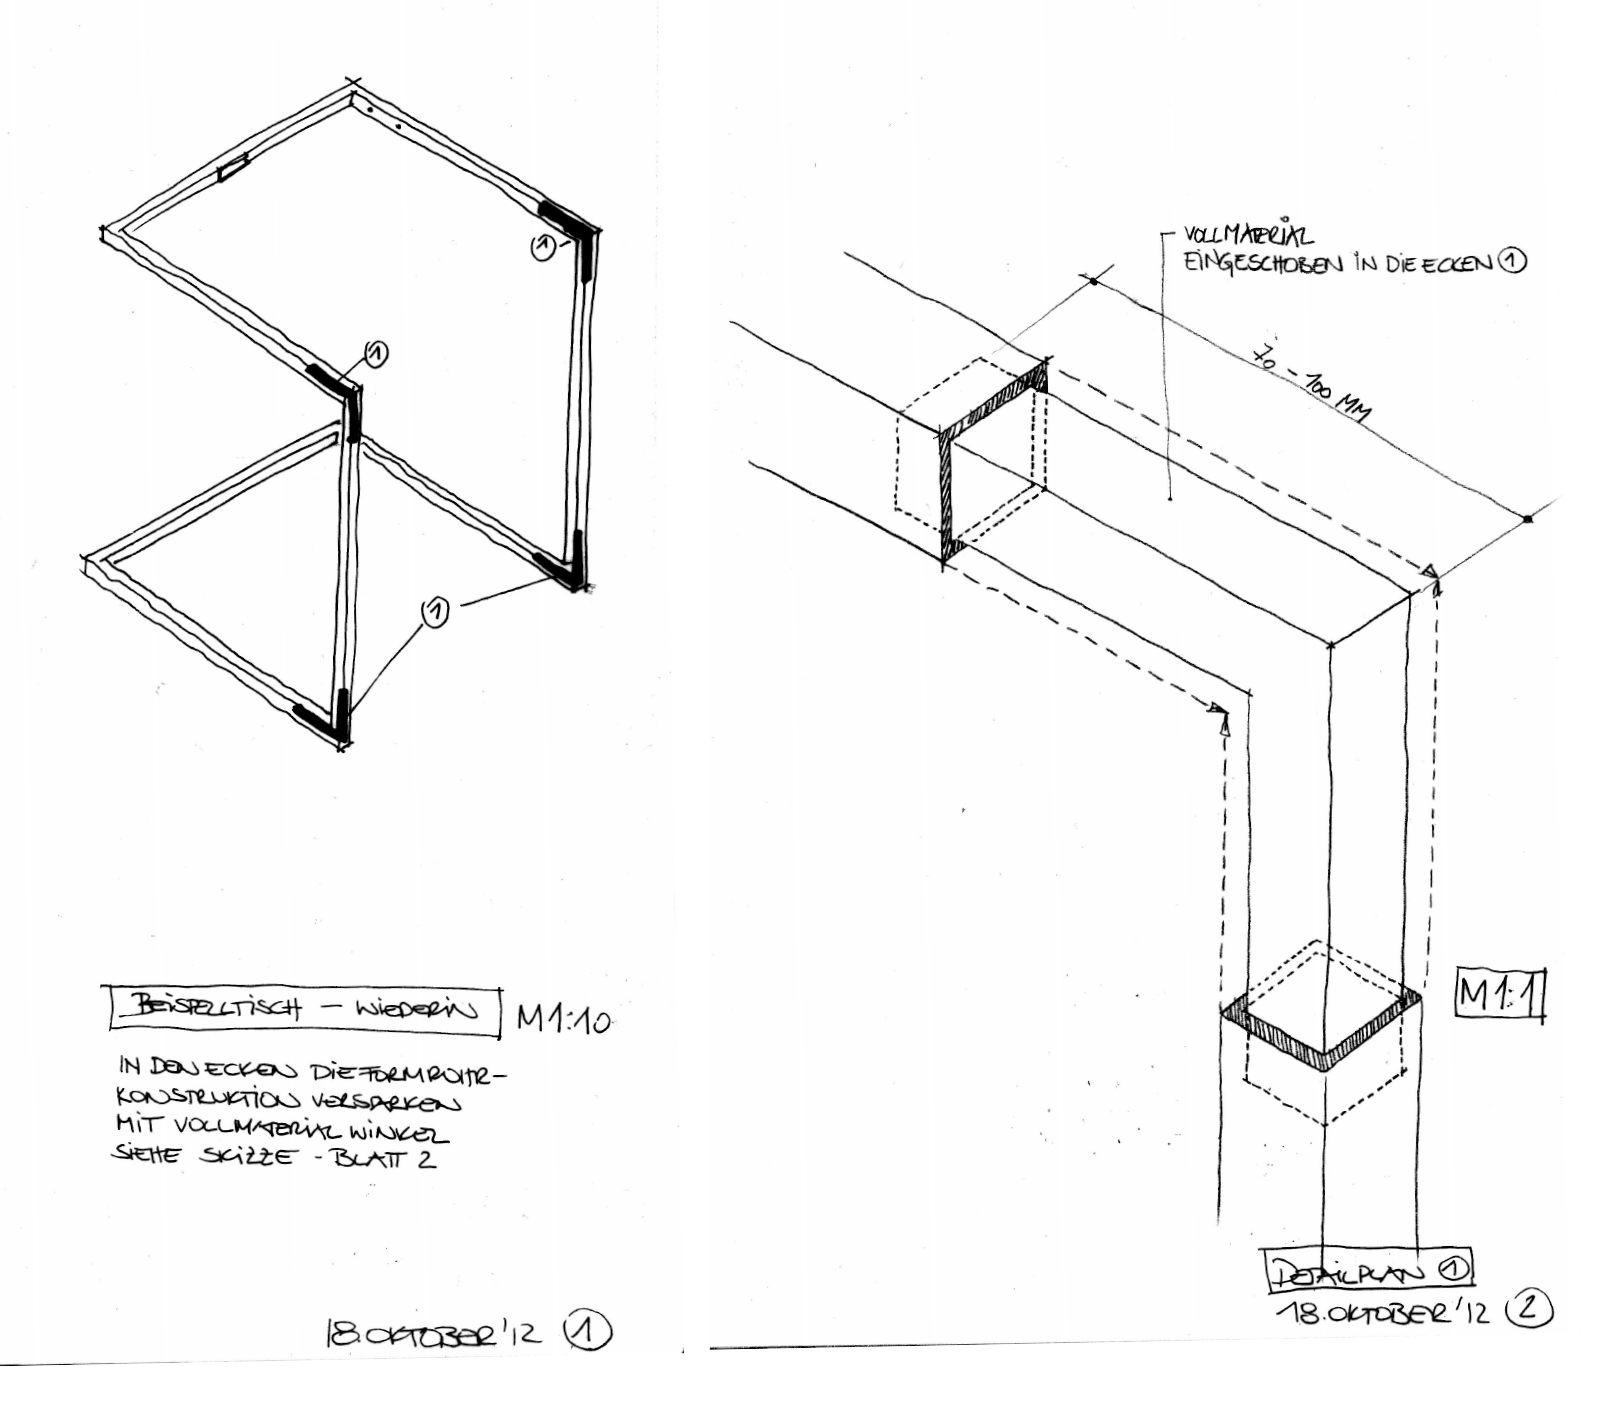 maki-ortner-furniture-Wiederin-Table-07-Thumbnail.jpg